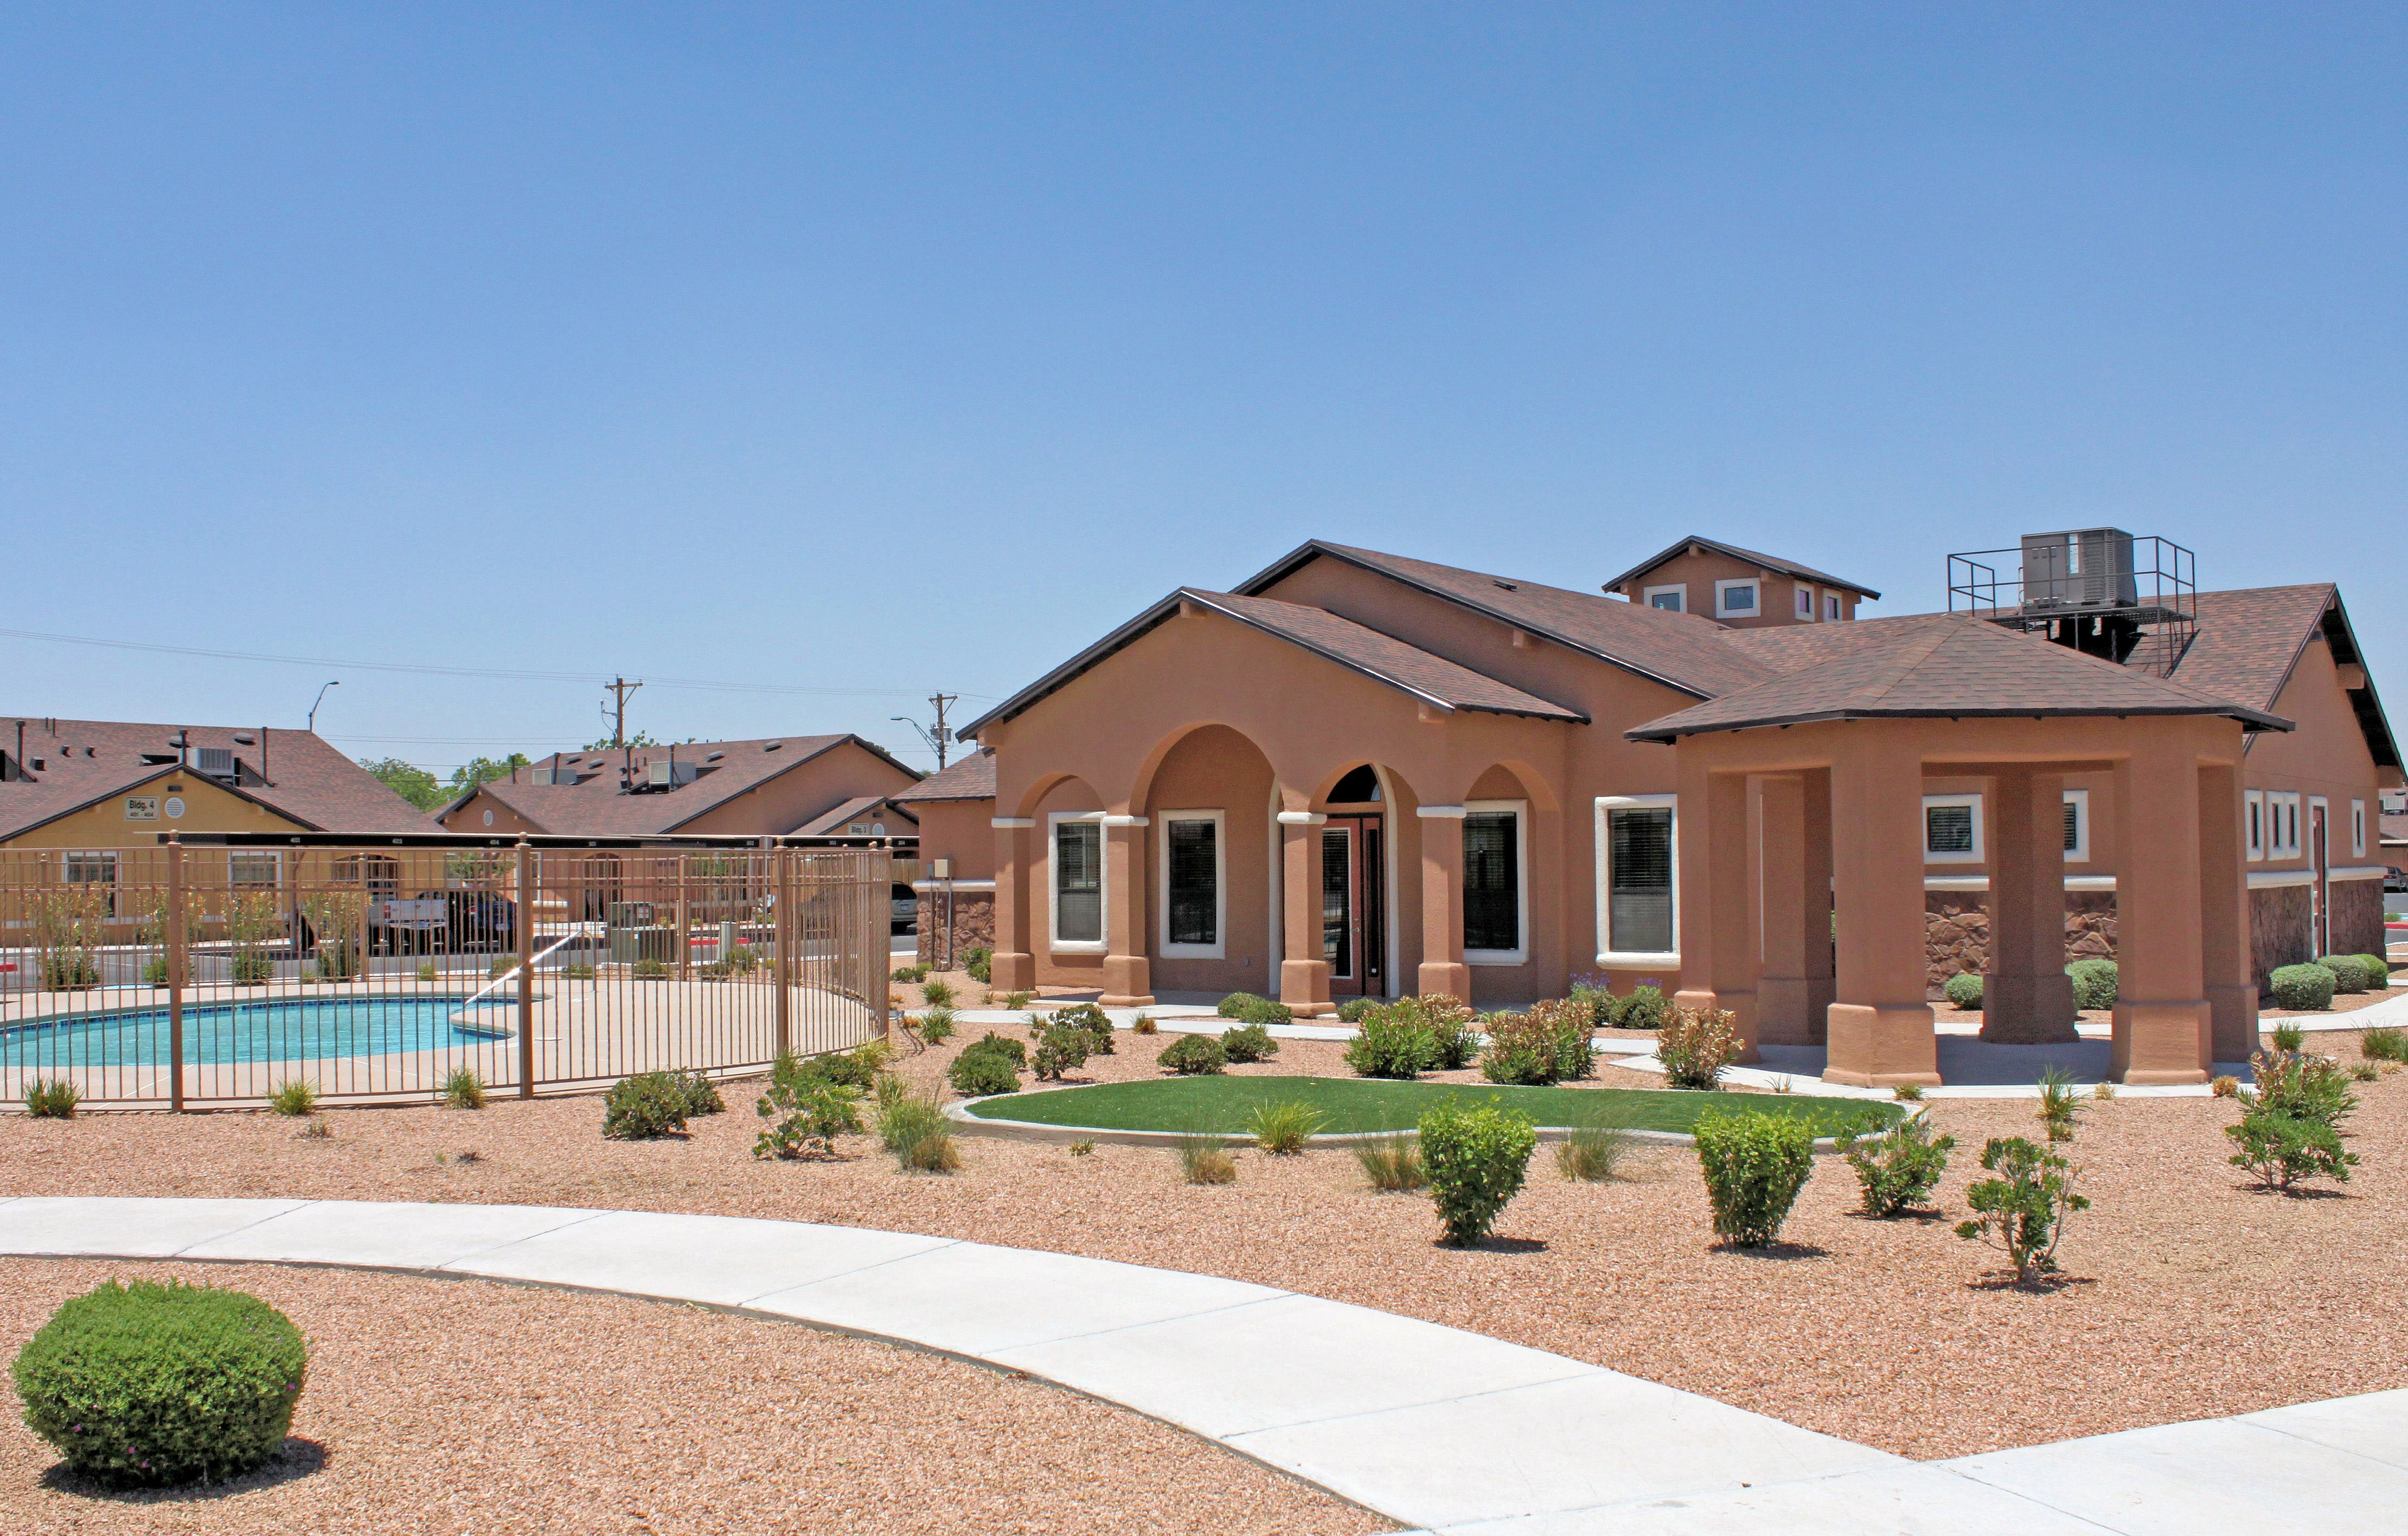 Woodchase Senior Community El Paso Tx House Styles Senior Communities Mansions